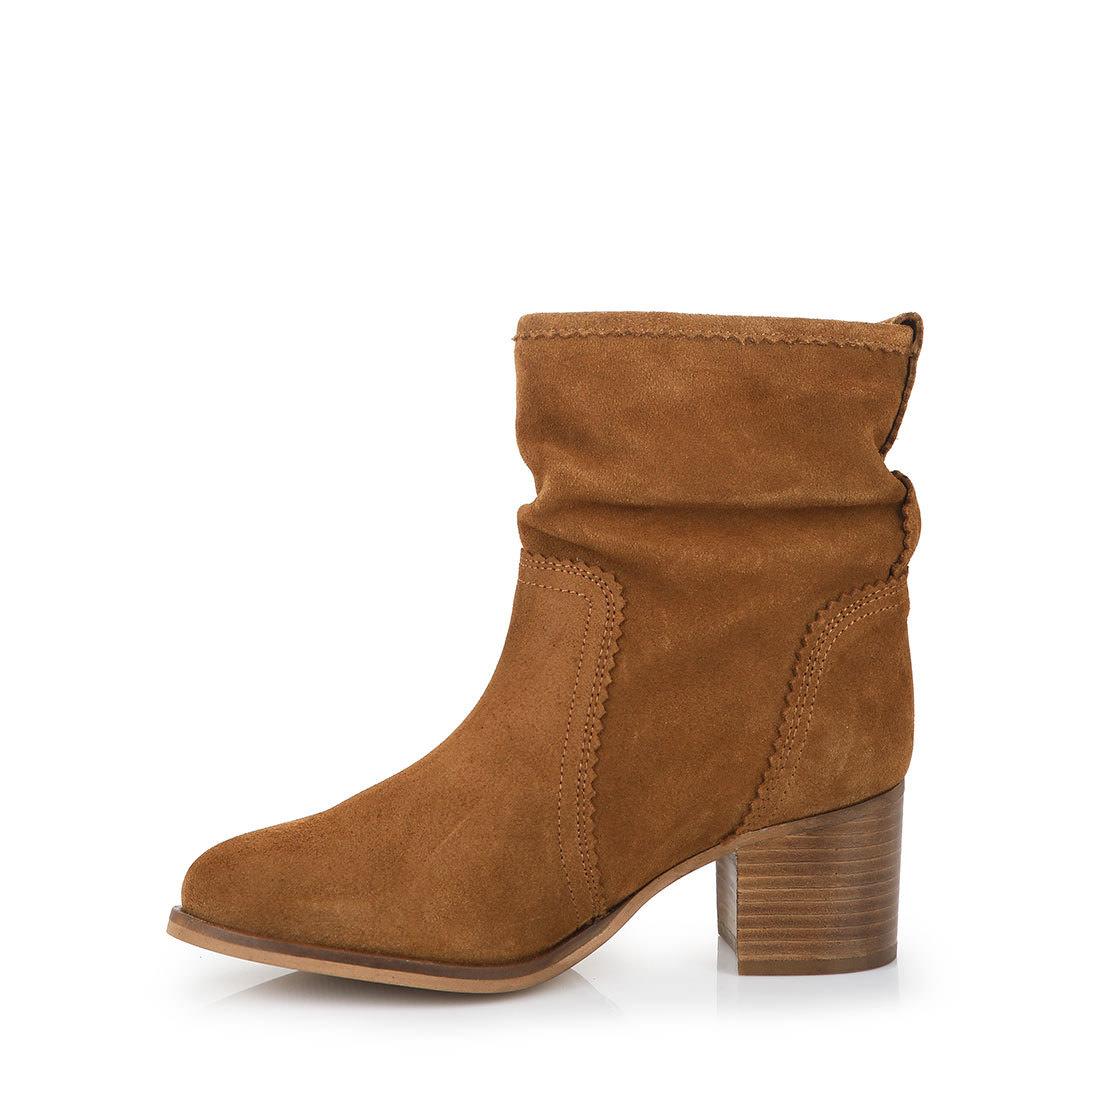 buffalo ankle boots in cognac buy online in buffalo online. Black Bedroom Furniture Sets. Home Design Ideas